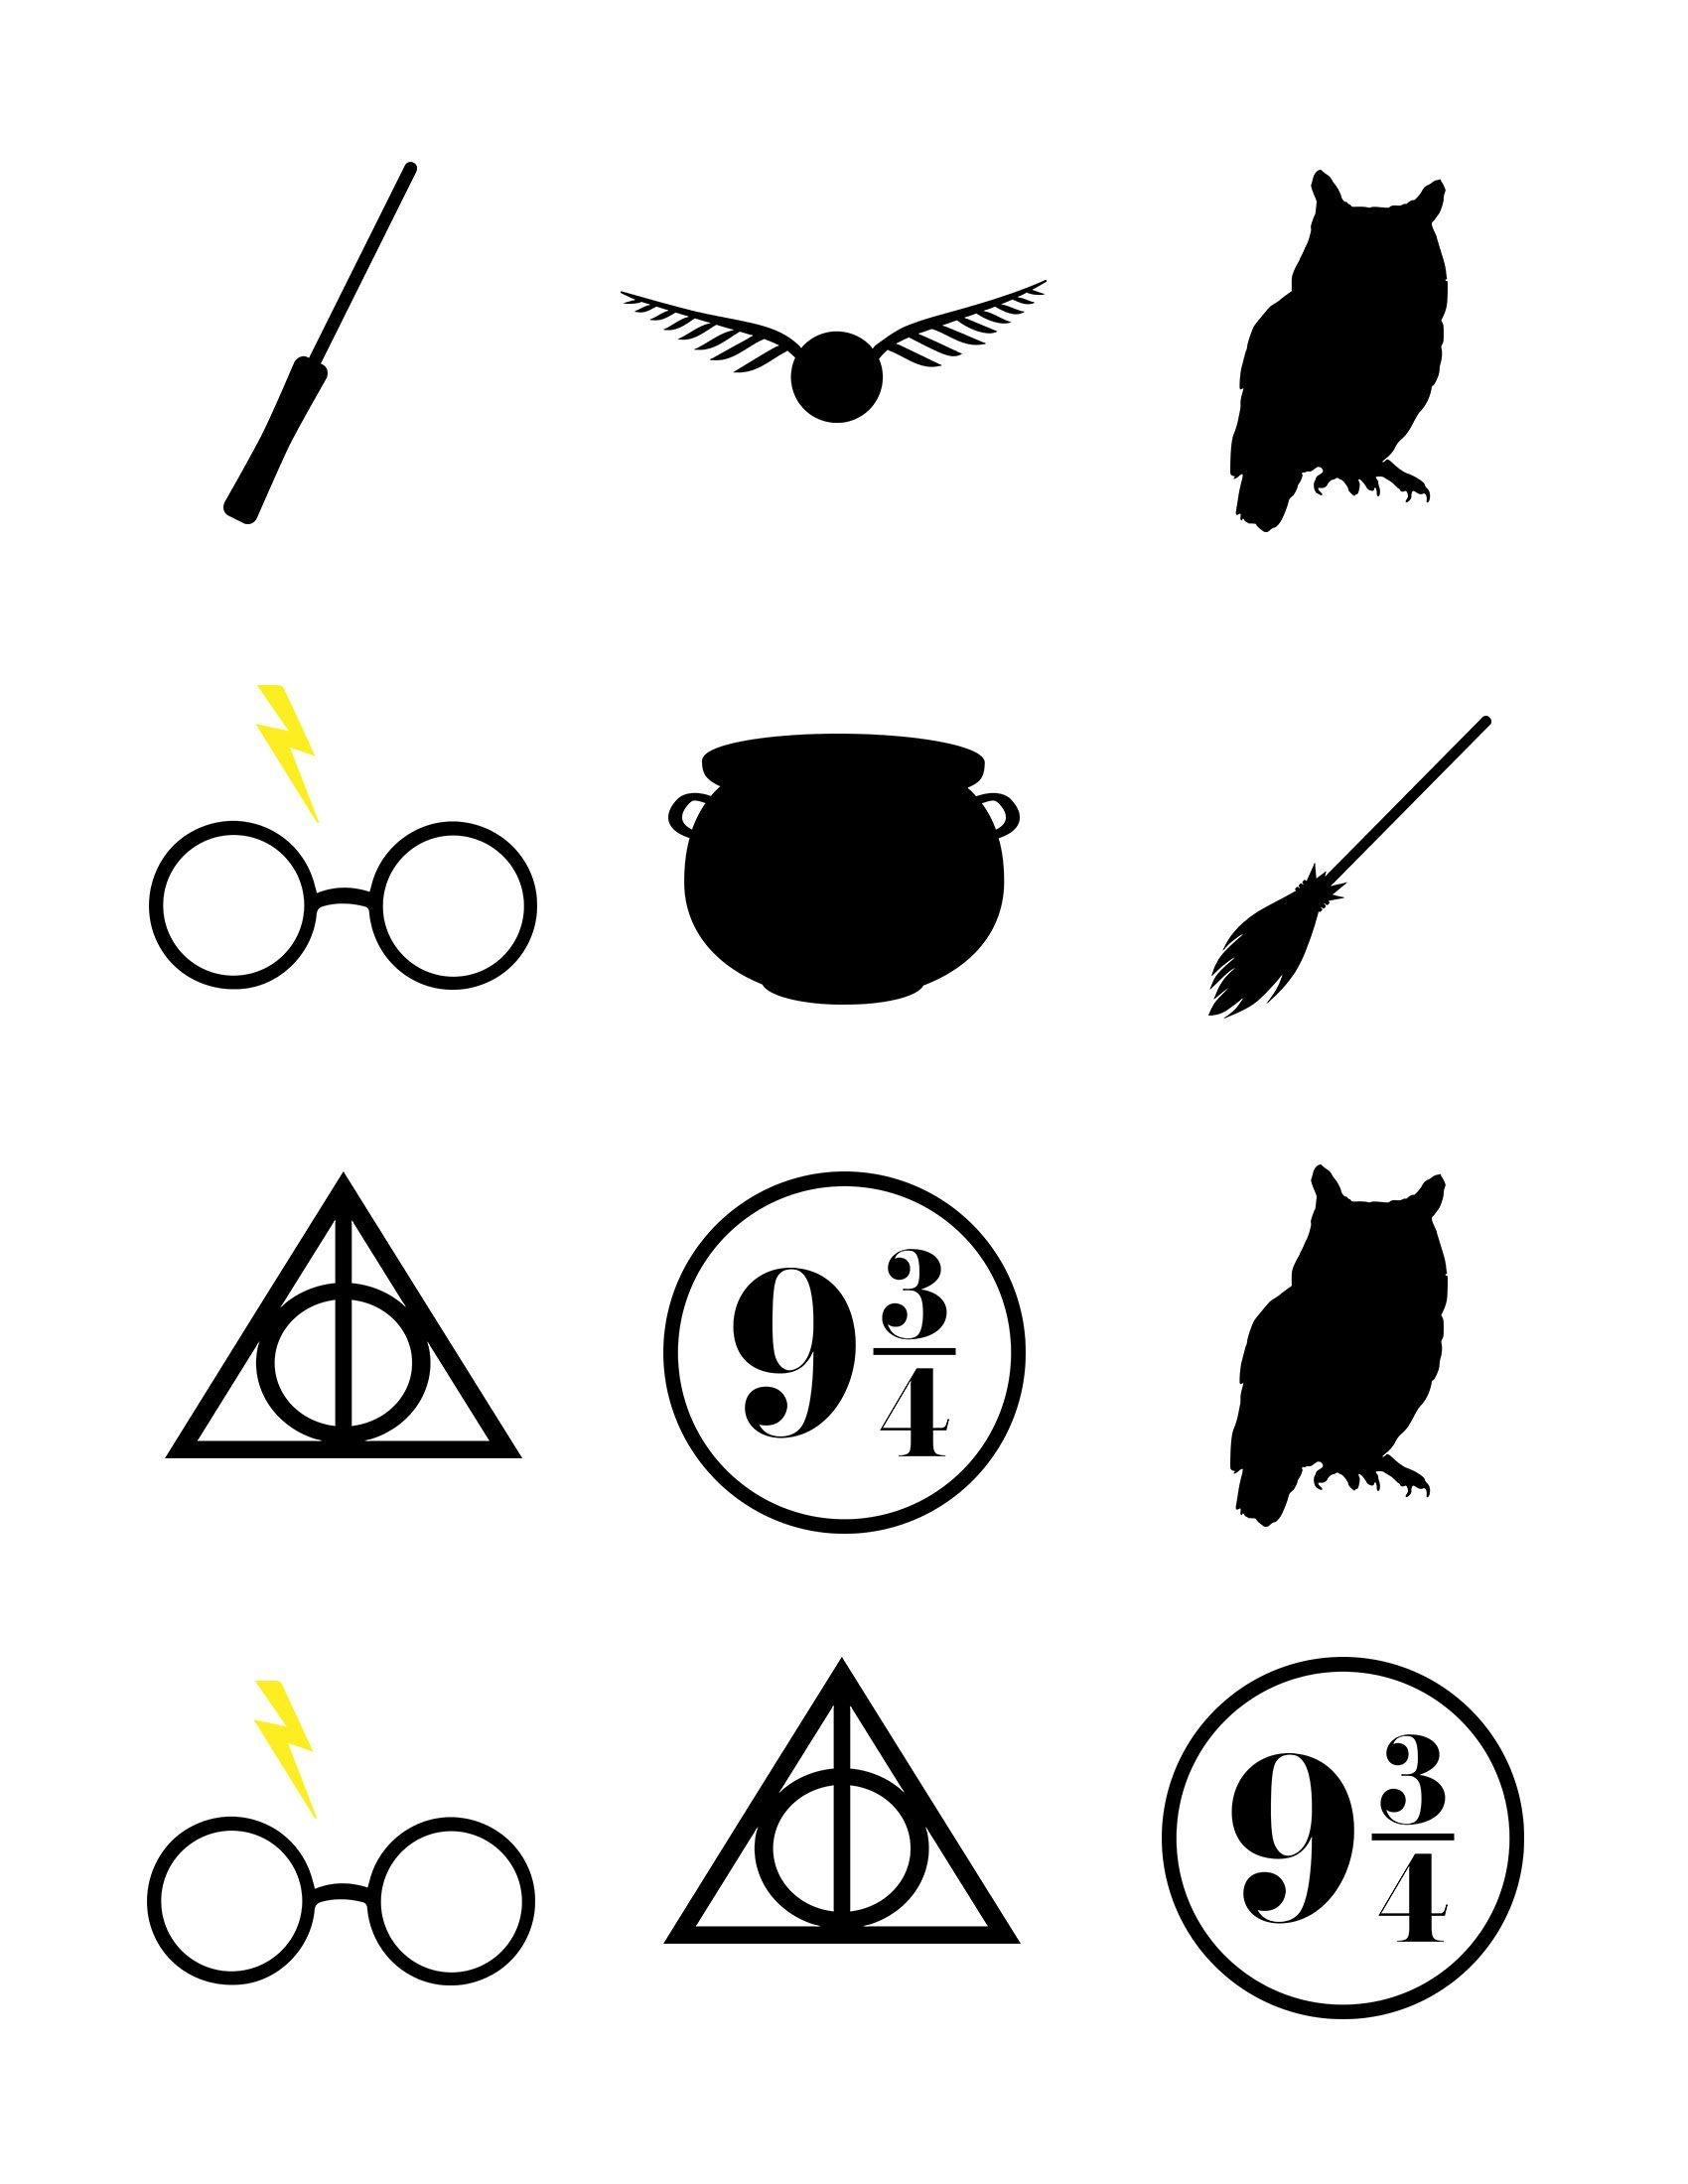 Harry Potter Baby Shower | Harry Potter Stuff | Harry Potter Baby - Free Printable Harry Potter Clip Art